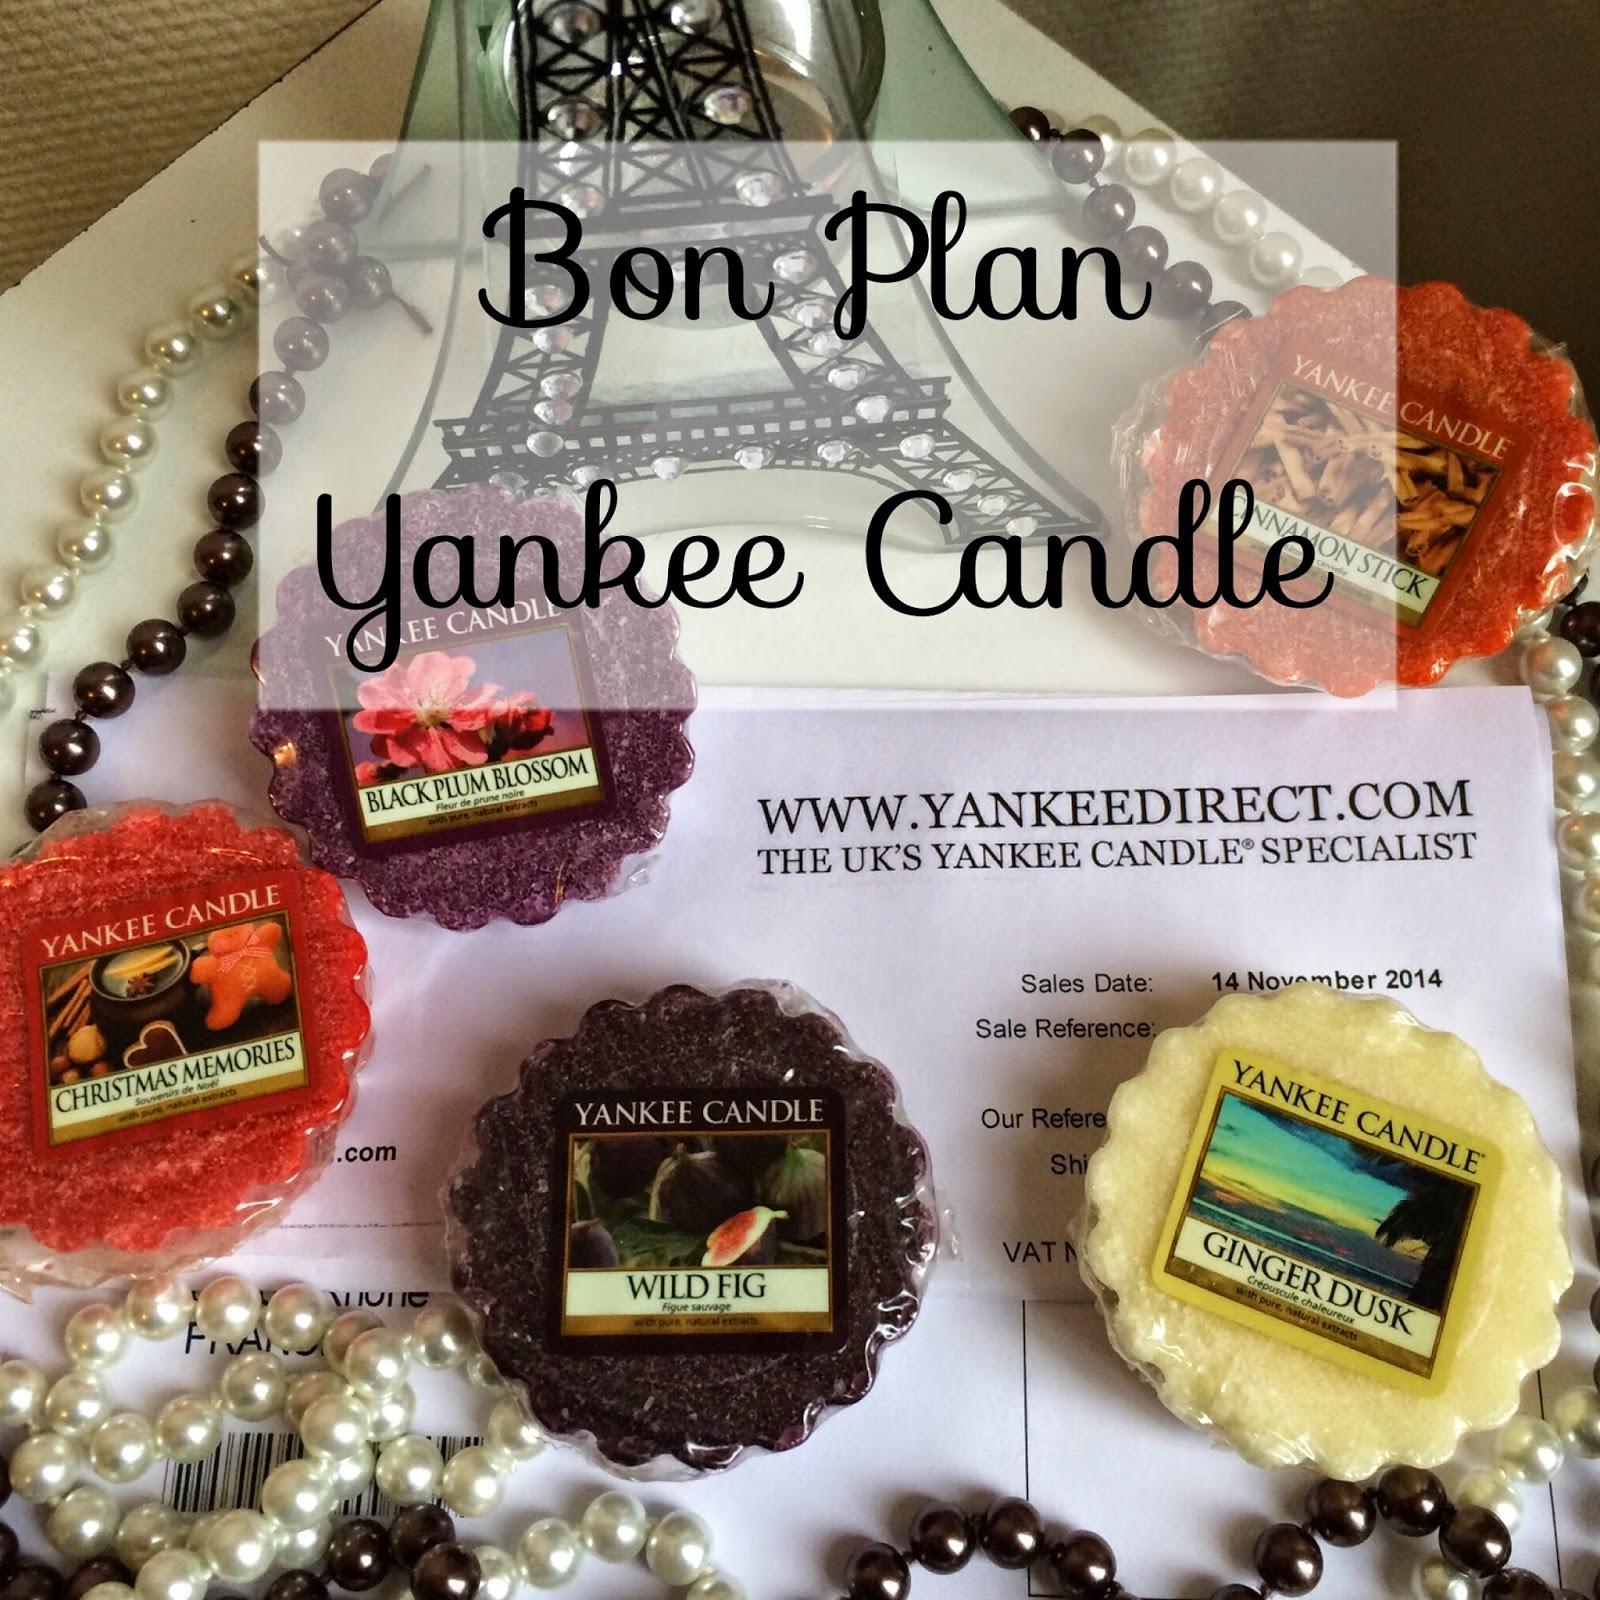 misso make up addict anonyme bon plan yankee candle pas cher. Black Bedroom Furniture Sets. Home Design Ideas